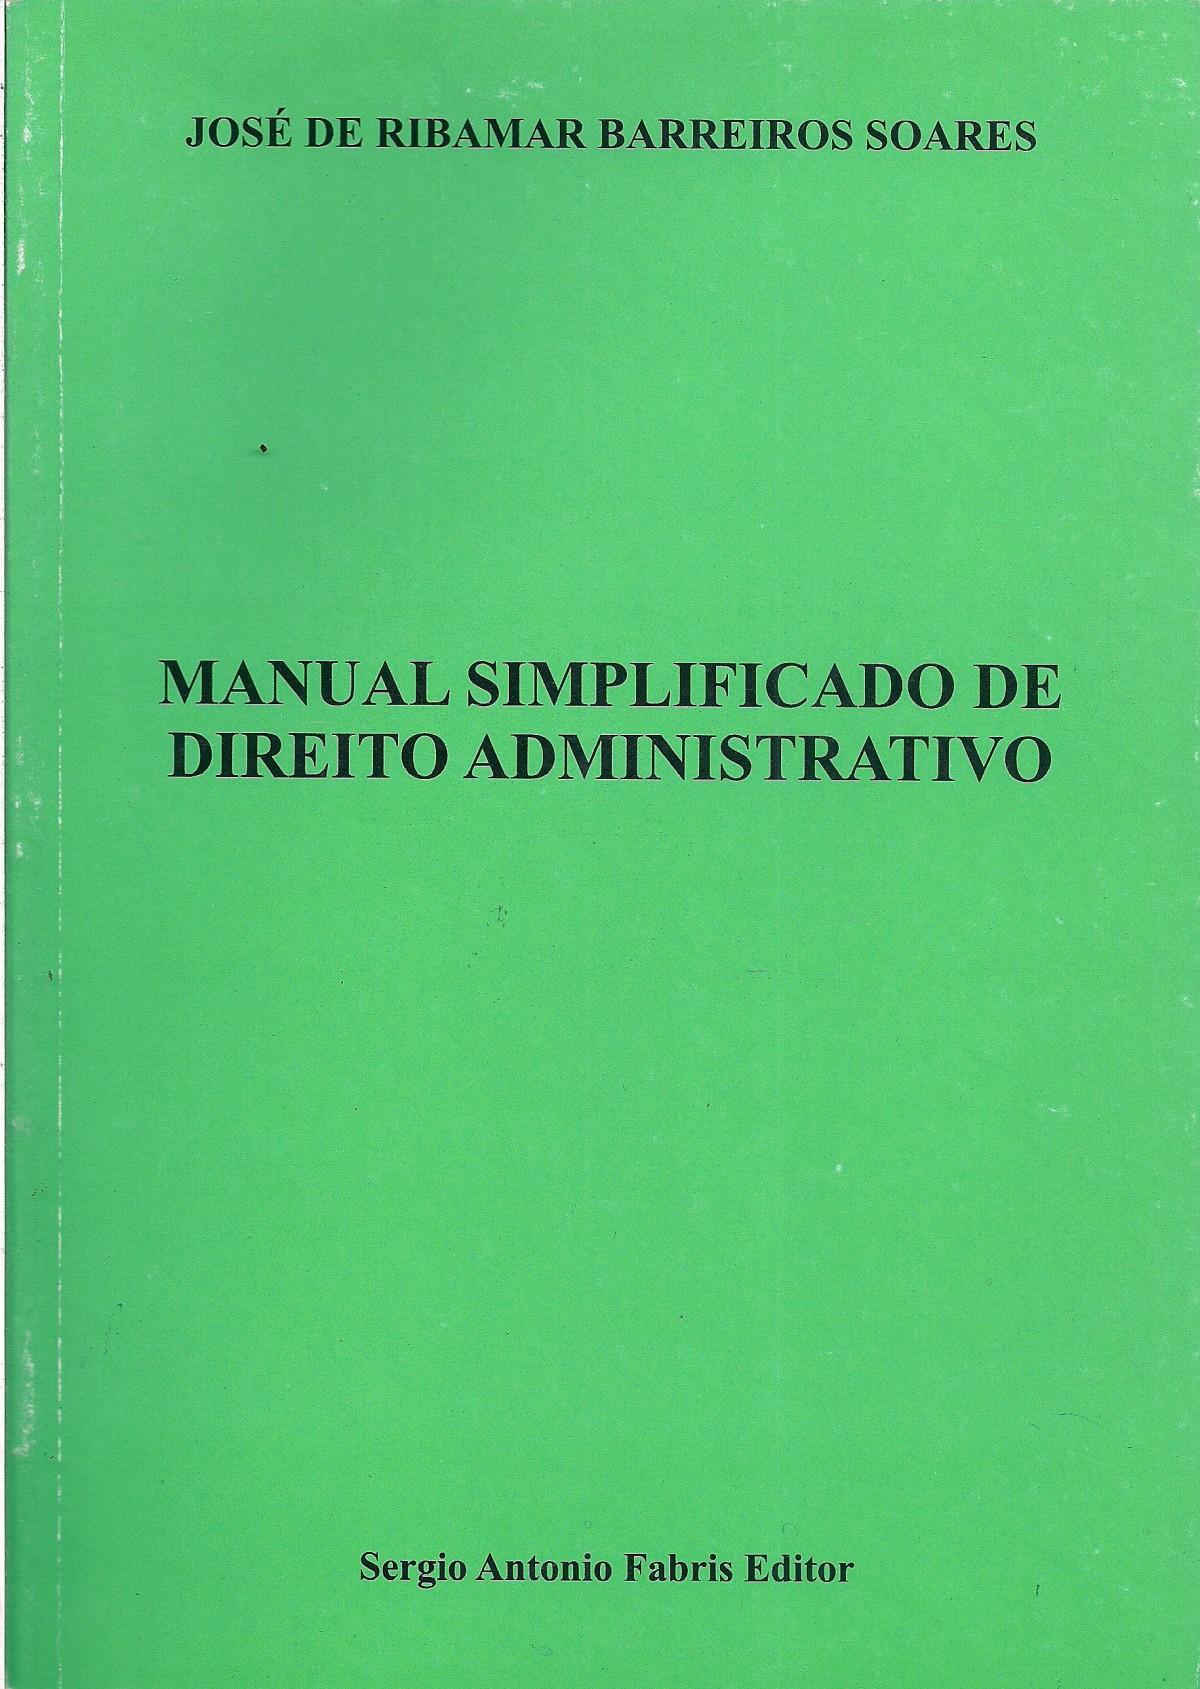 Foto 1 - Manual Simplificado de Direito Administrativo